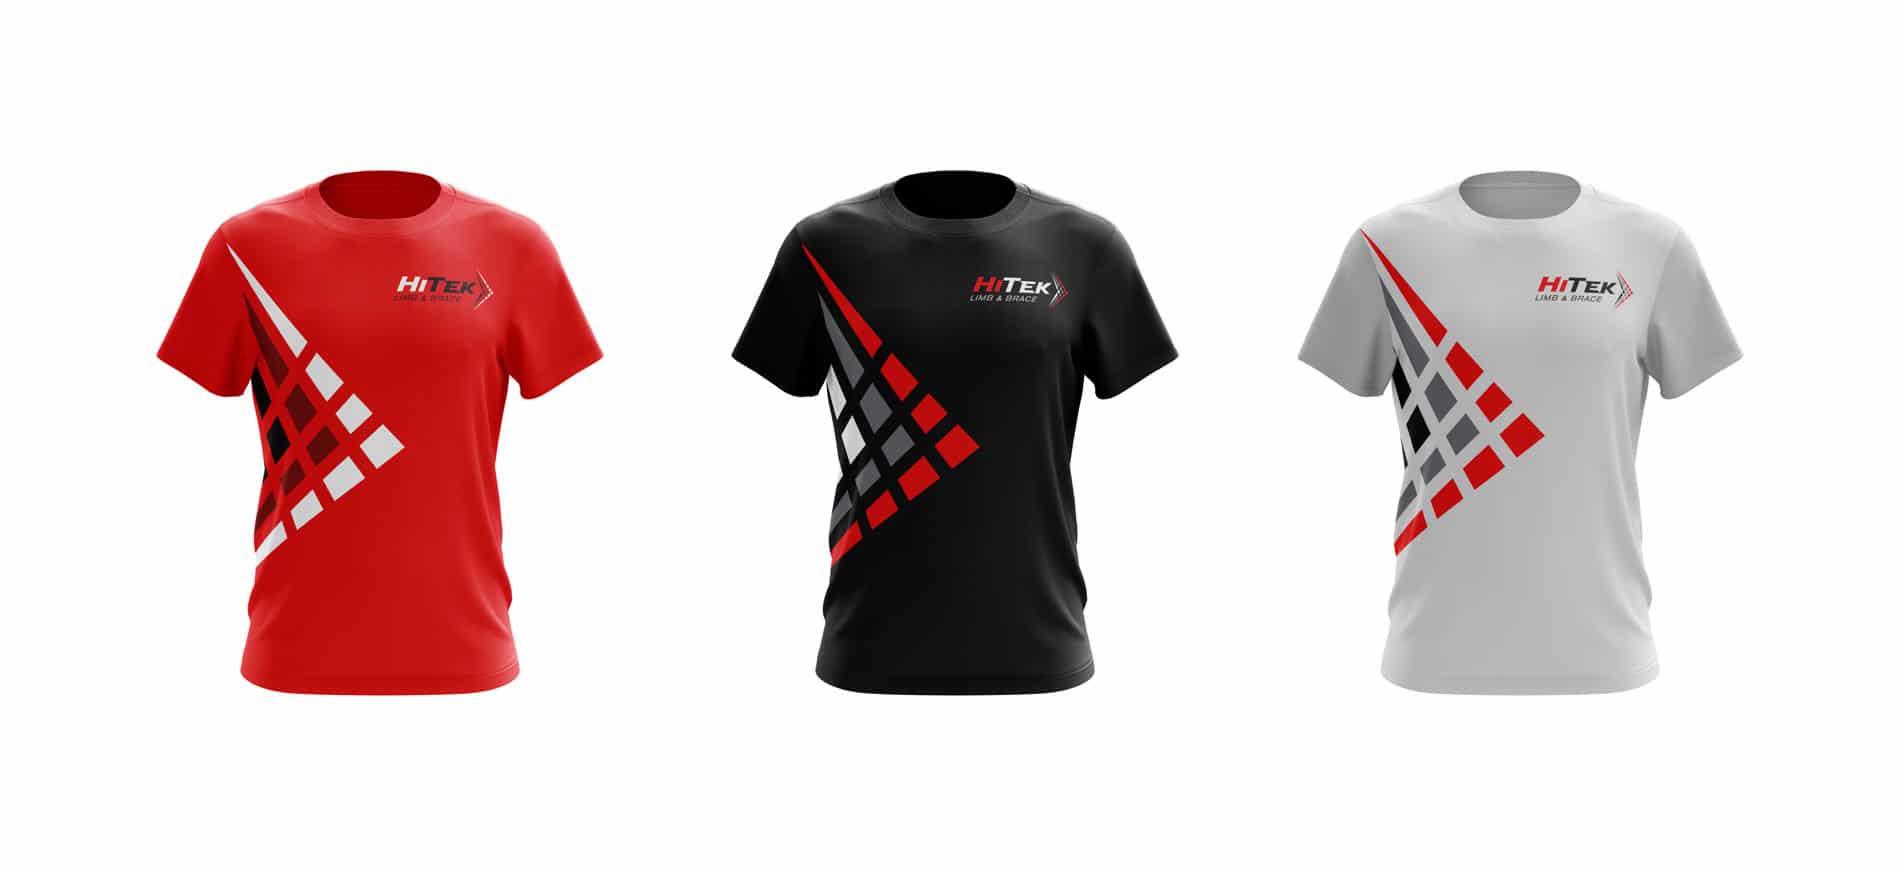 HiTek t-shirt designs